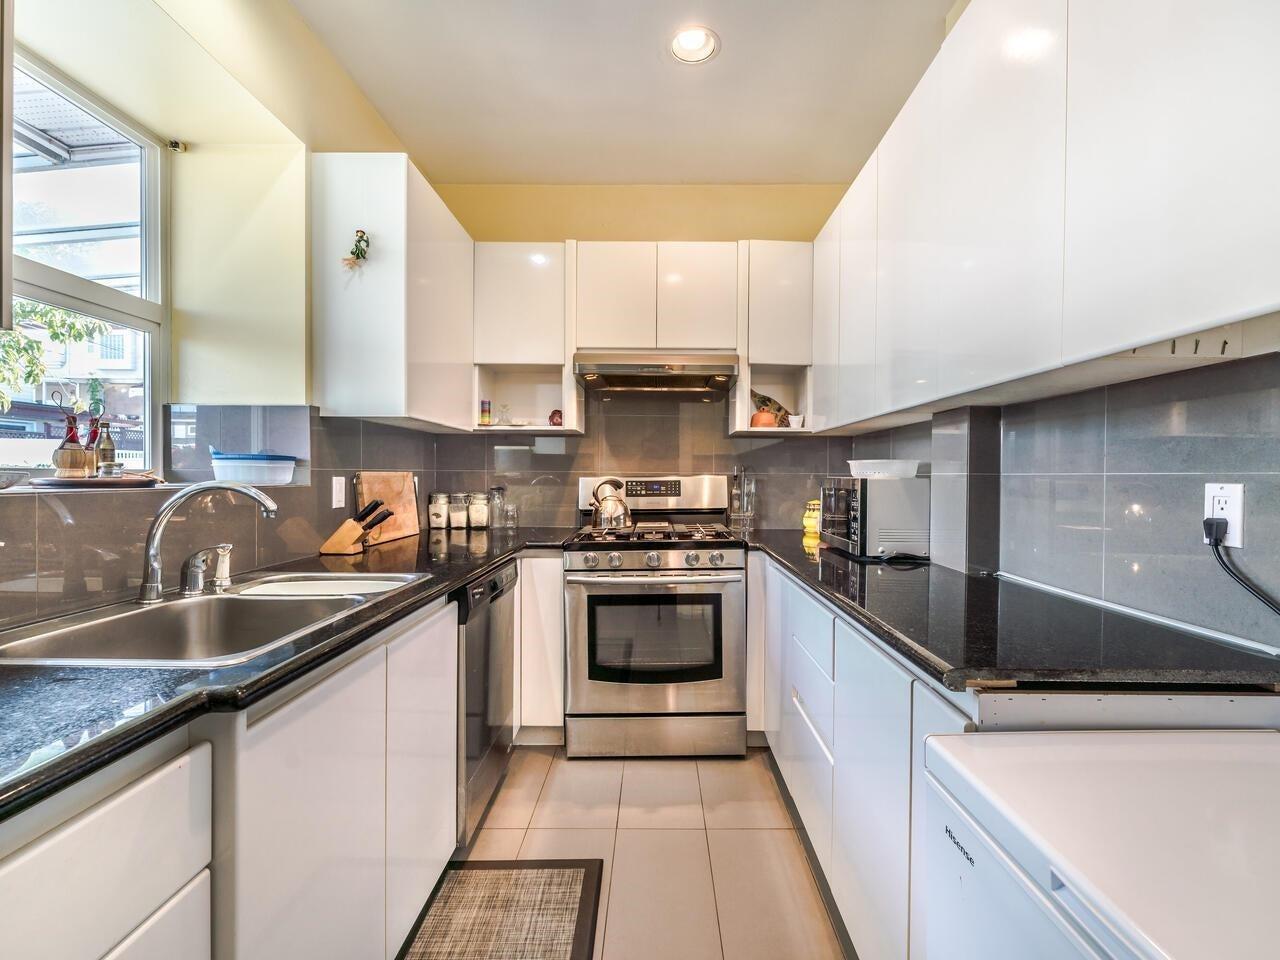 7888 JASPER CRESCENT - Fraserview VE House/Single Family for sale, 7 Bedrooms (R2622945) - #17